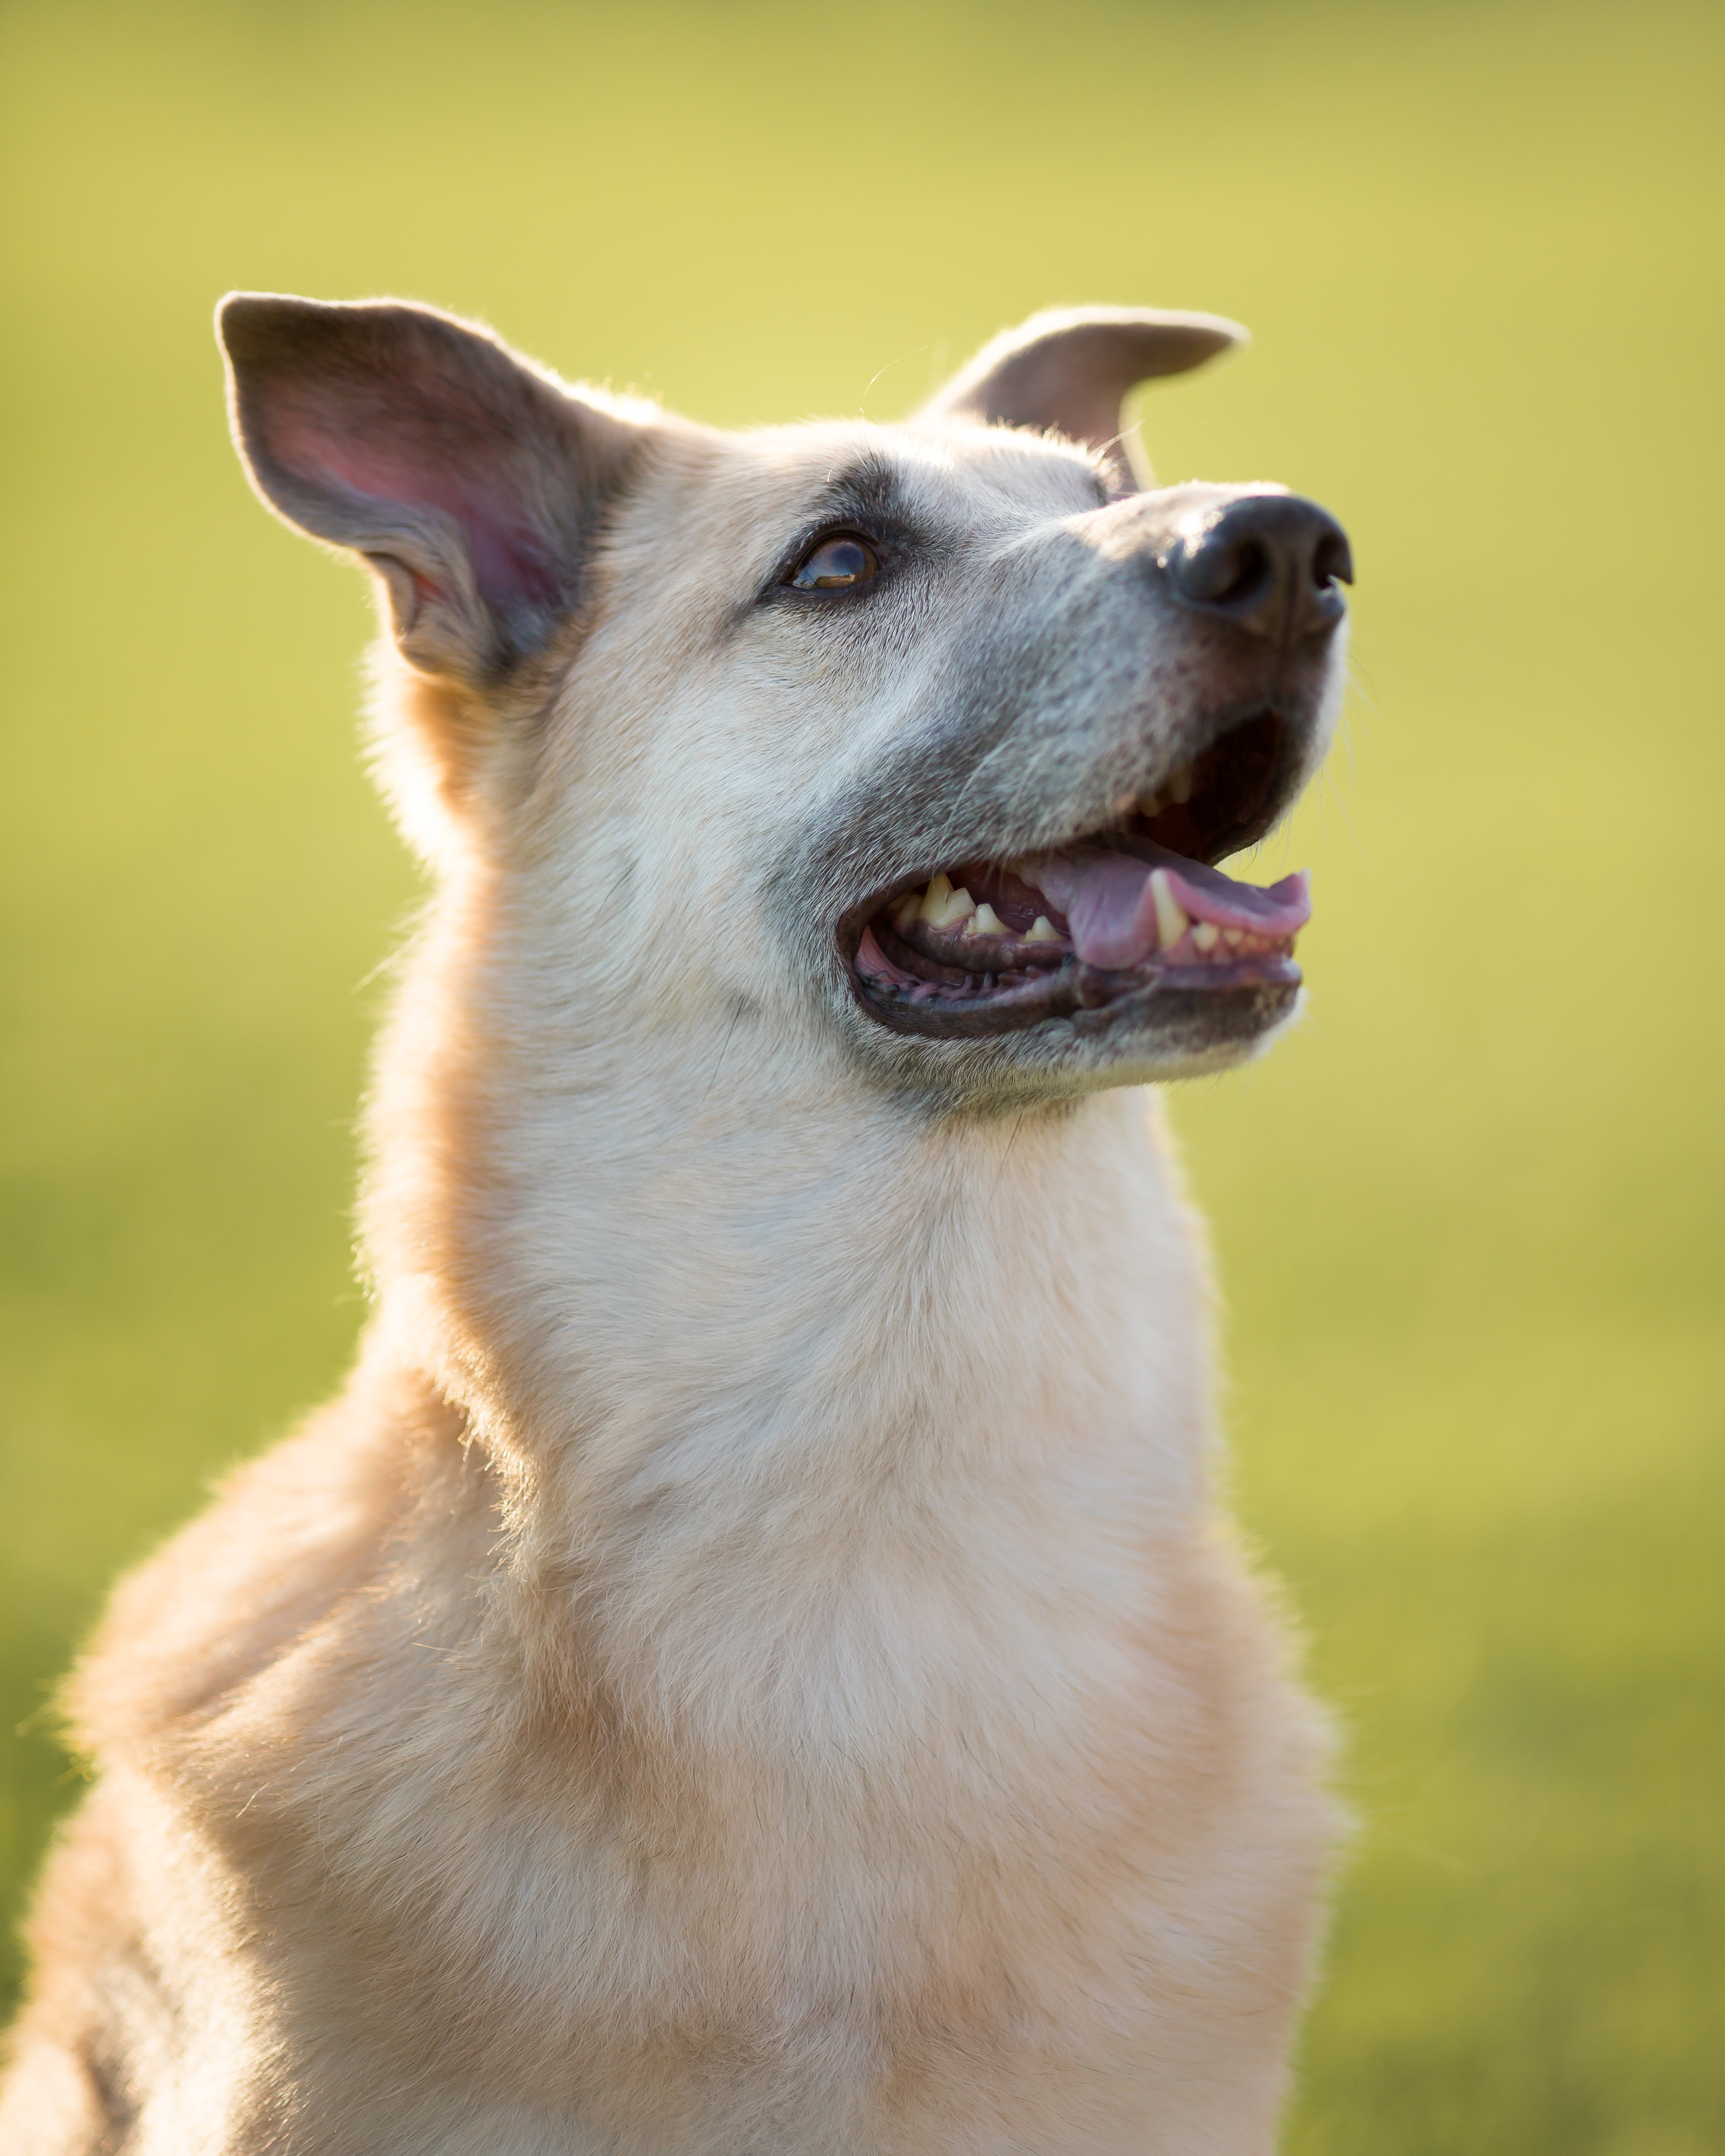 Denver Pet Photography, Denver Pet Portraits, Pet Photos Denver, Cat Photography Denver, Animal Photos, Denver Dog Photography